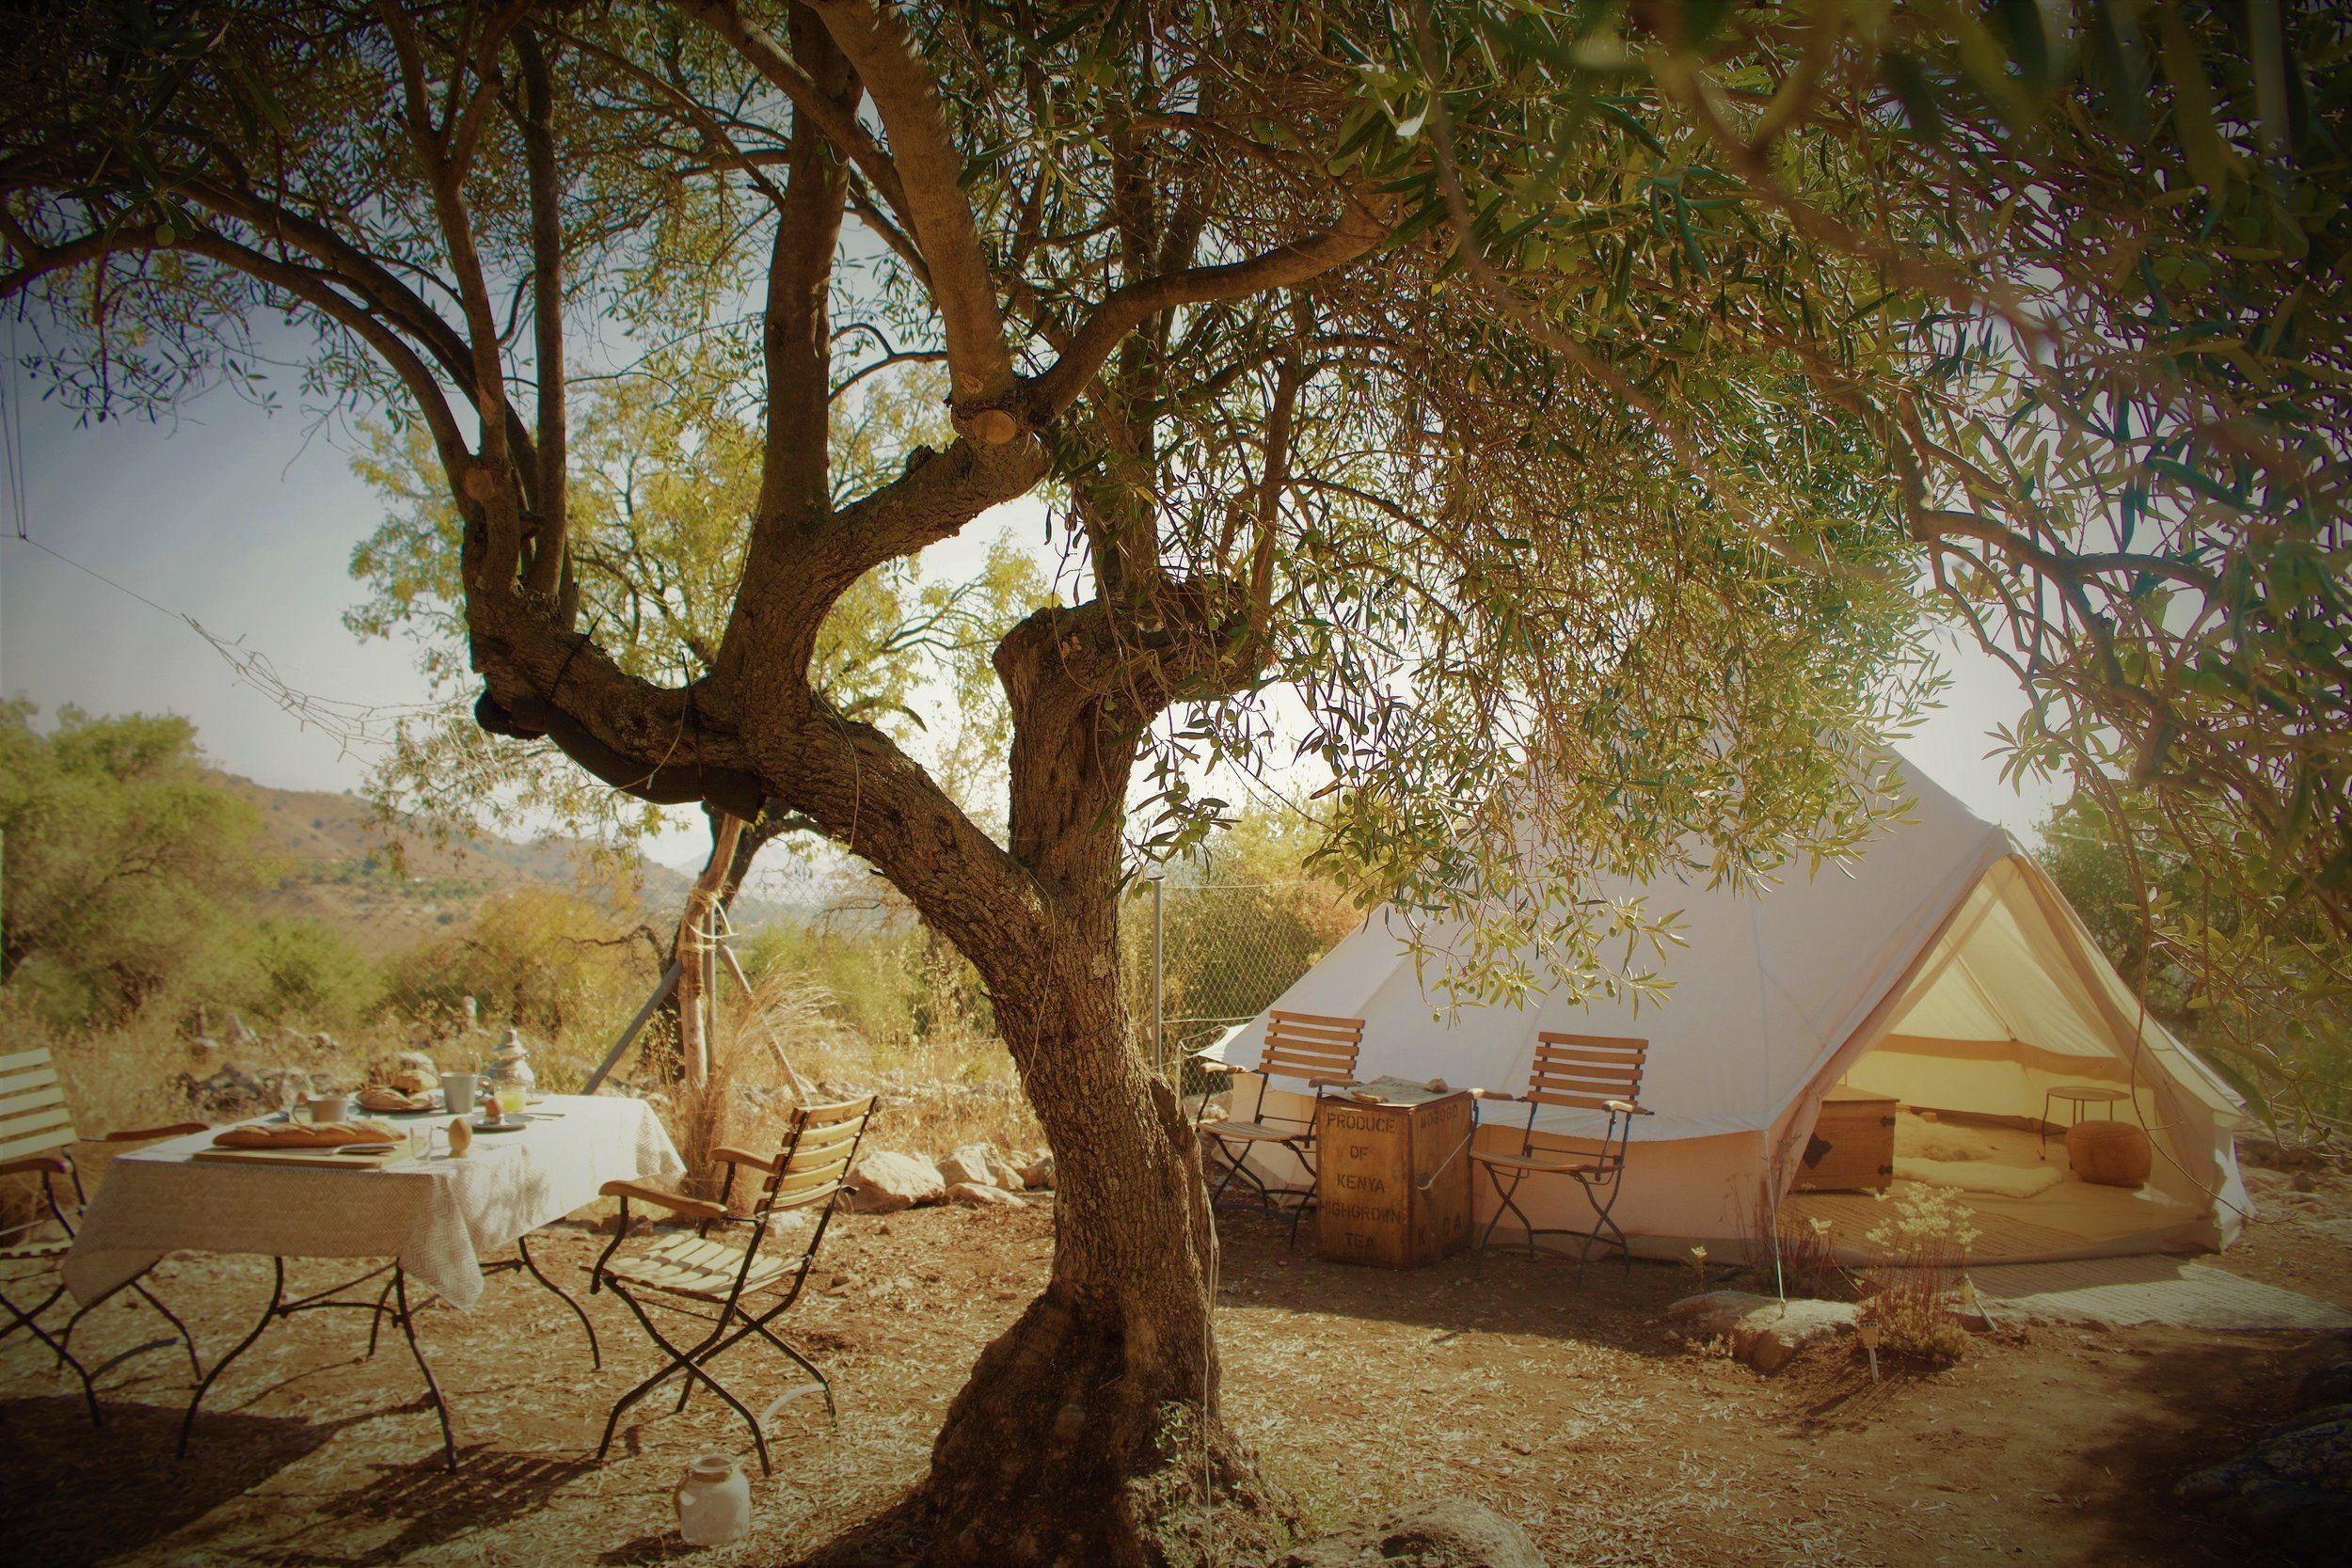 Camping Spanje Adalusie Marbella 4 Kampeerplekken Glamping Tent Living Andalusia